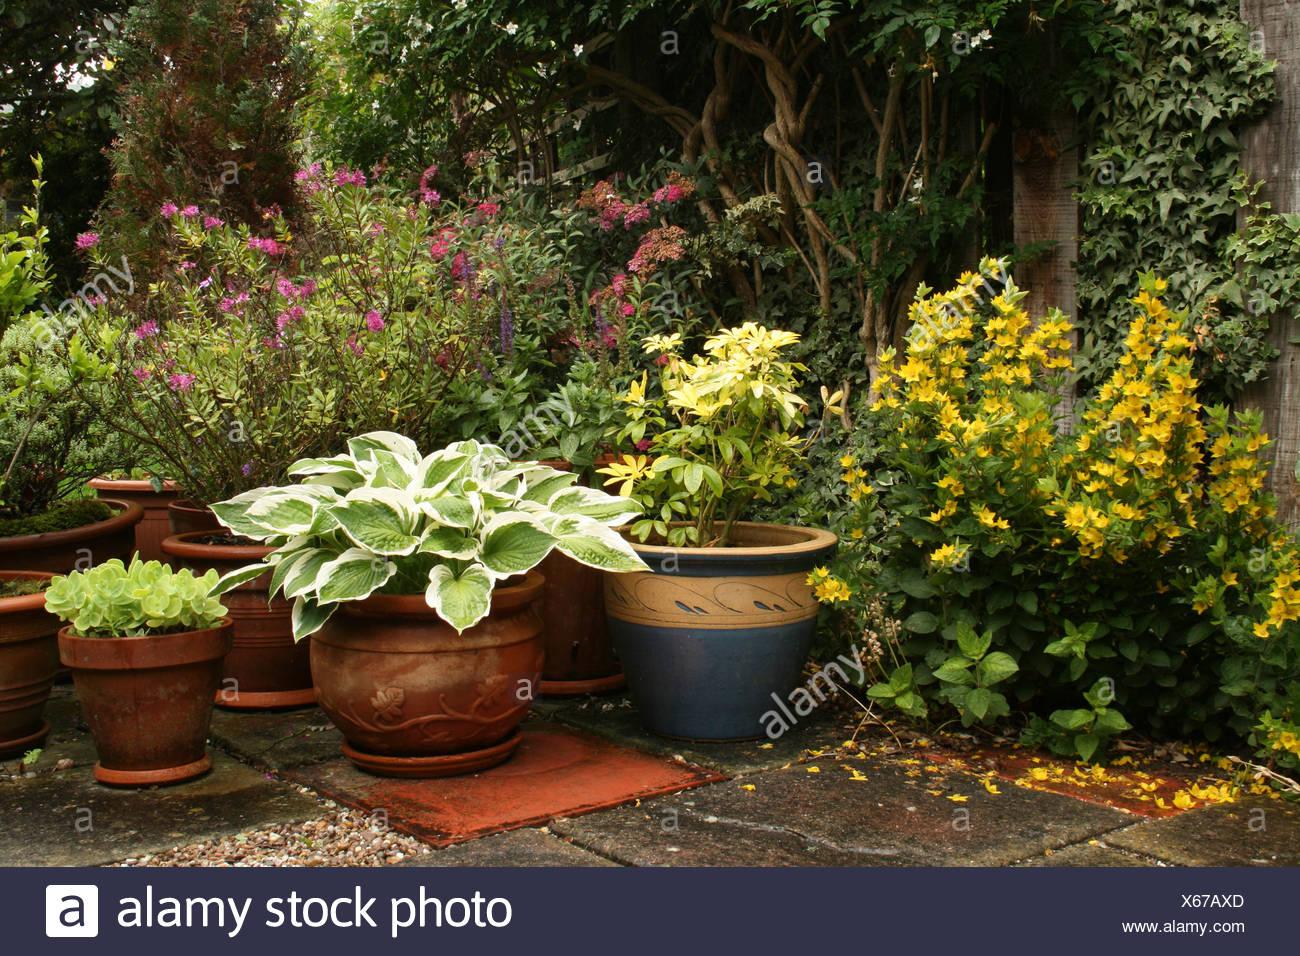 An Arrangement Of Patio Pots In An English Garden Stock Photo Alamy